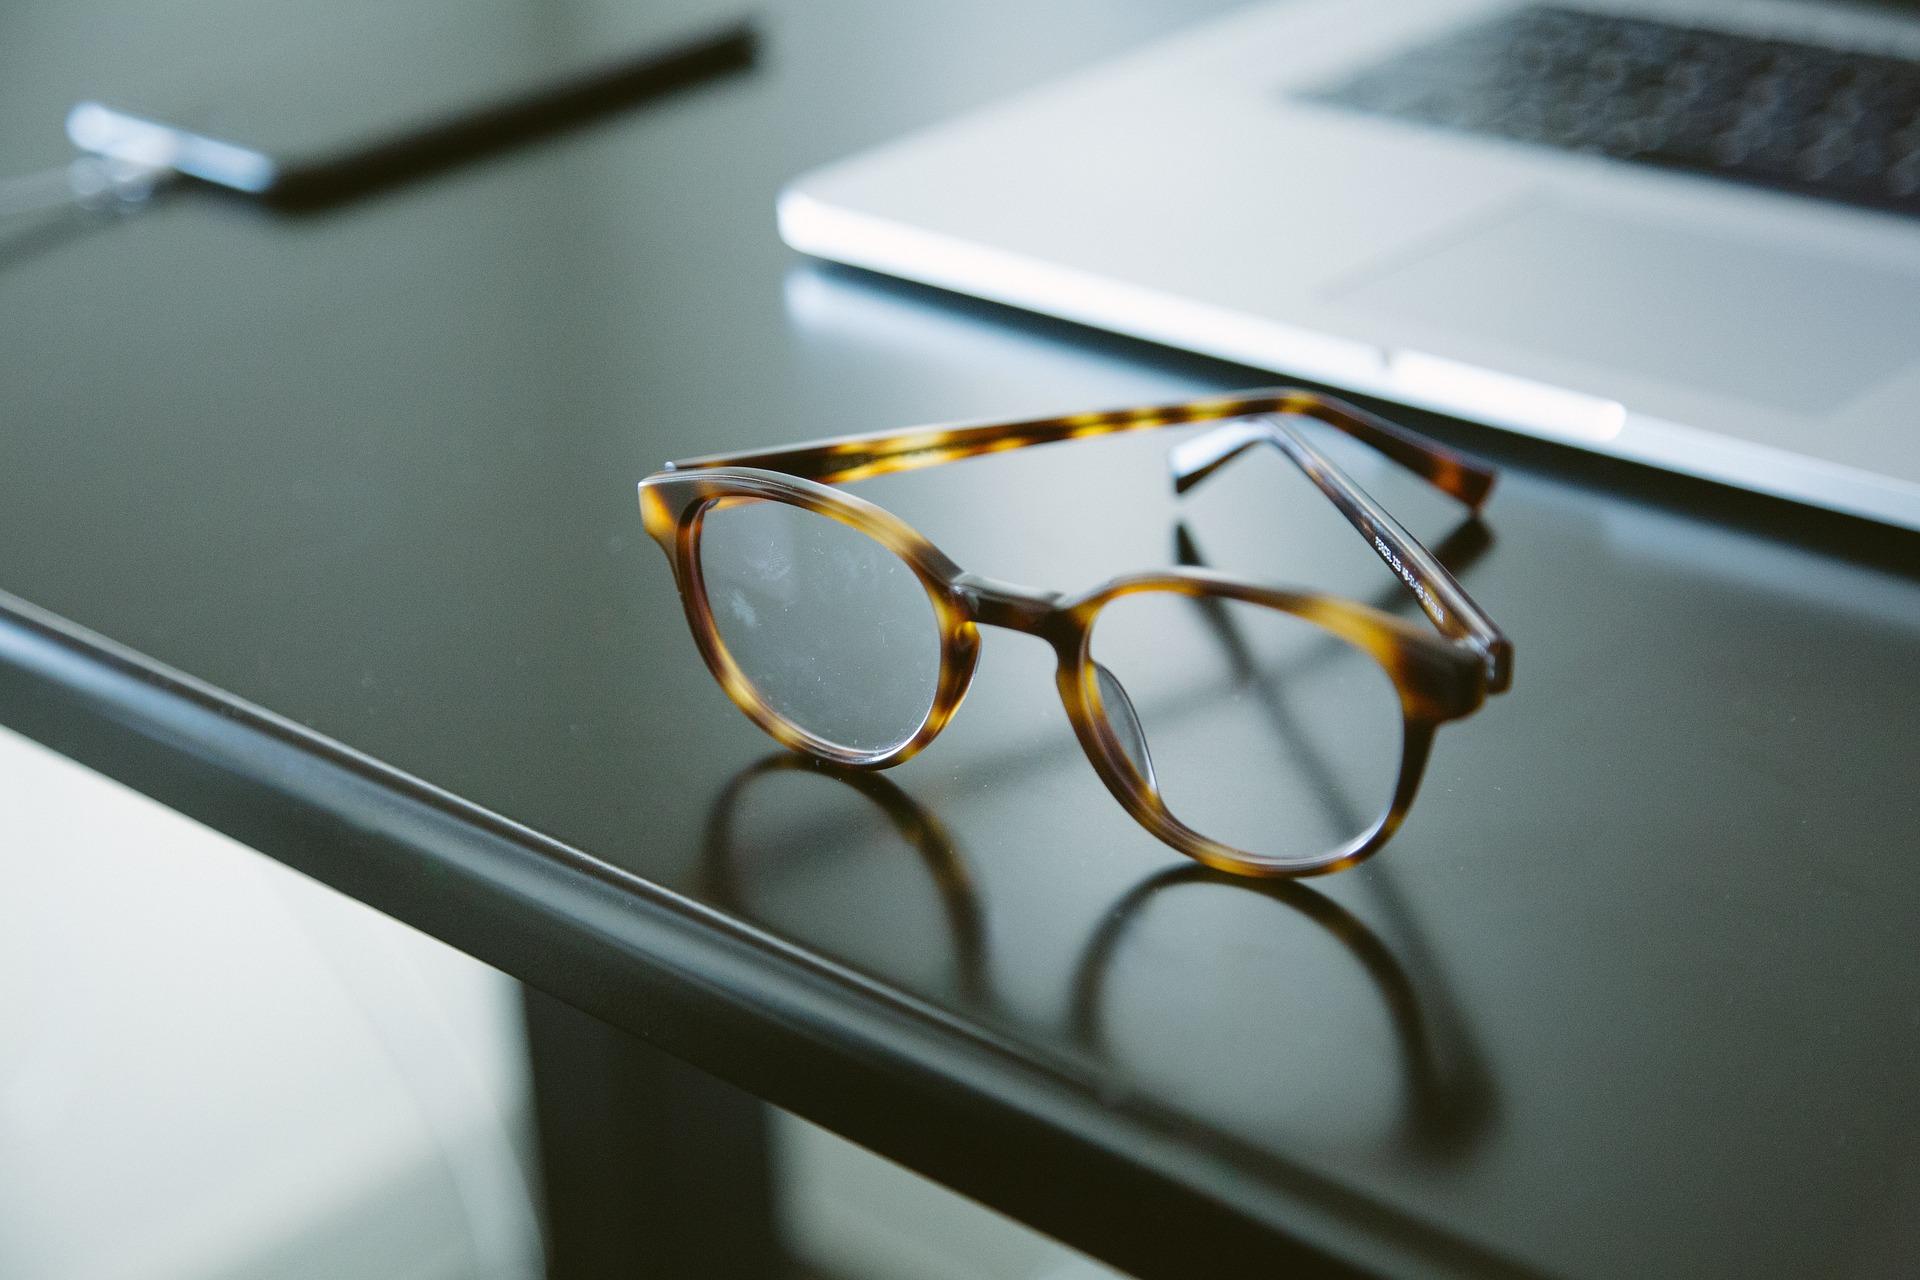 eyeglasses-2593033_1920